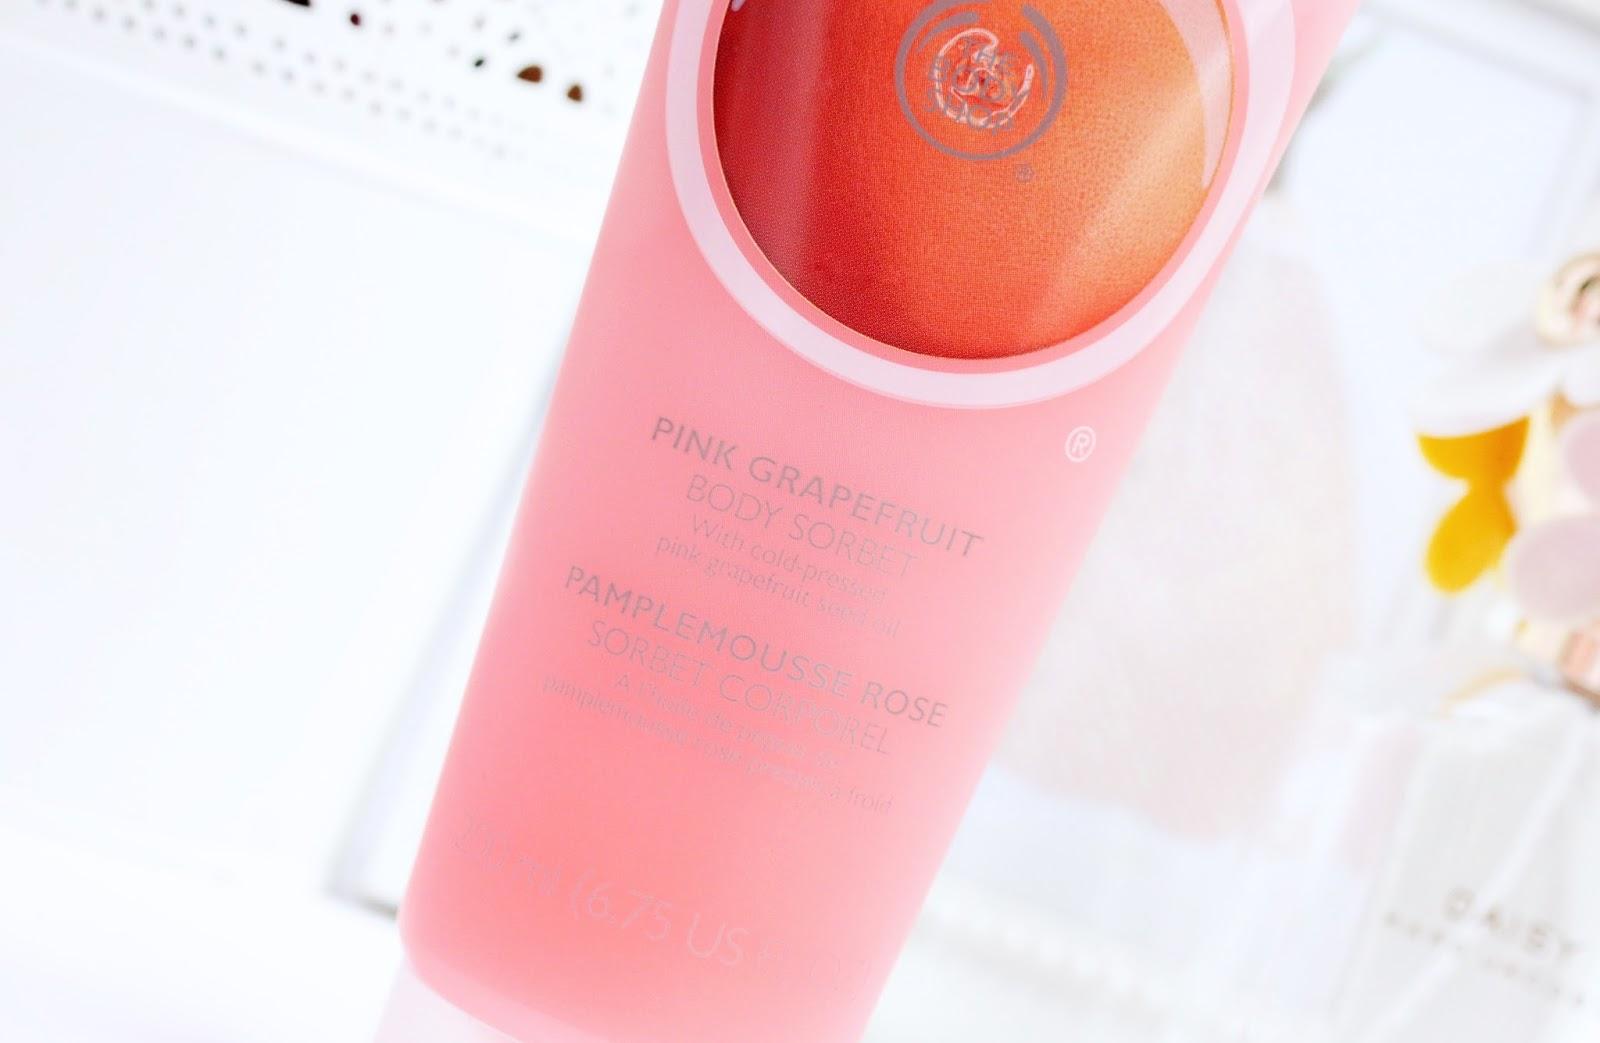 the body shop pink grapefruit body sorbet